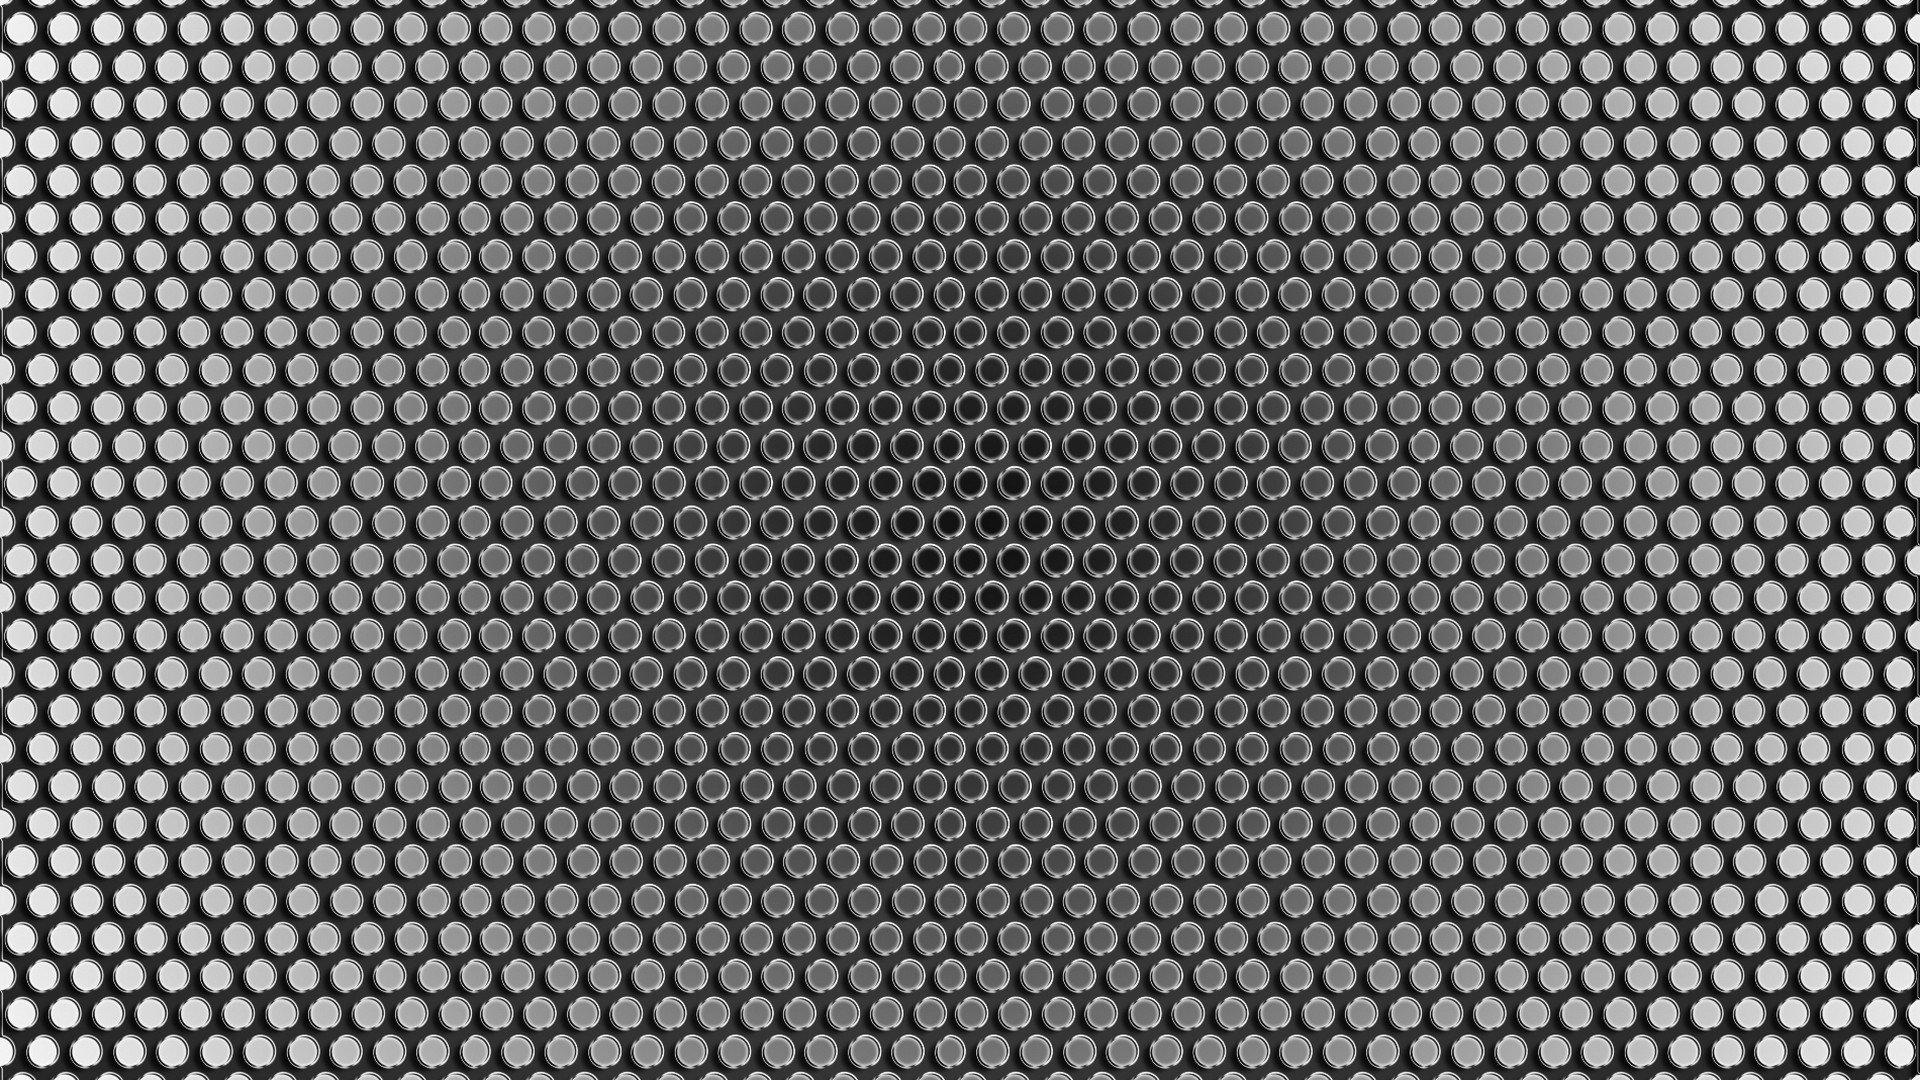 Metal patterns templates textures metallic wallpaper 1920x1080 1920x1080